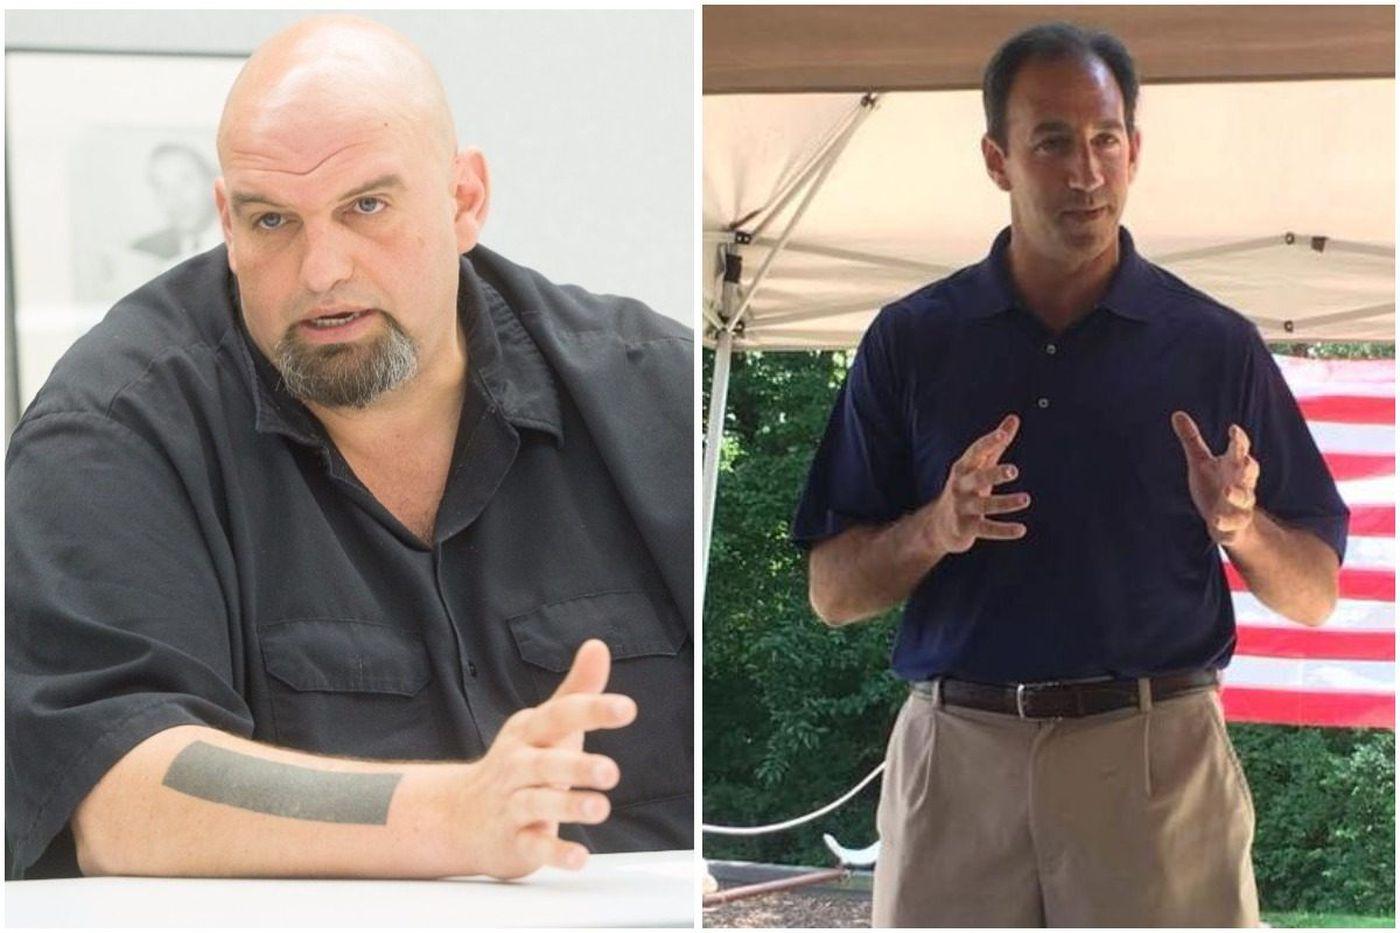 For Pa. lieutenant governor: Democrat John Fetterman; Republican Jeff Bartos | Endorsement